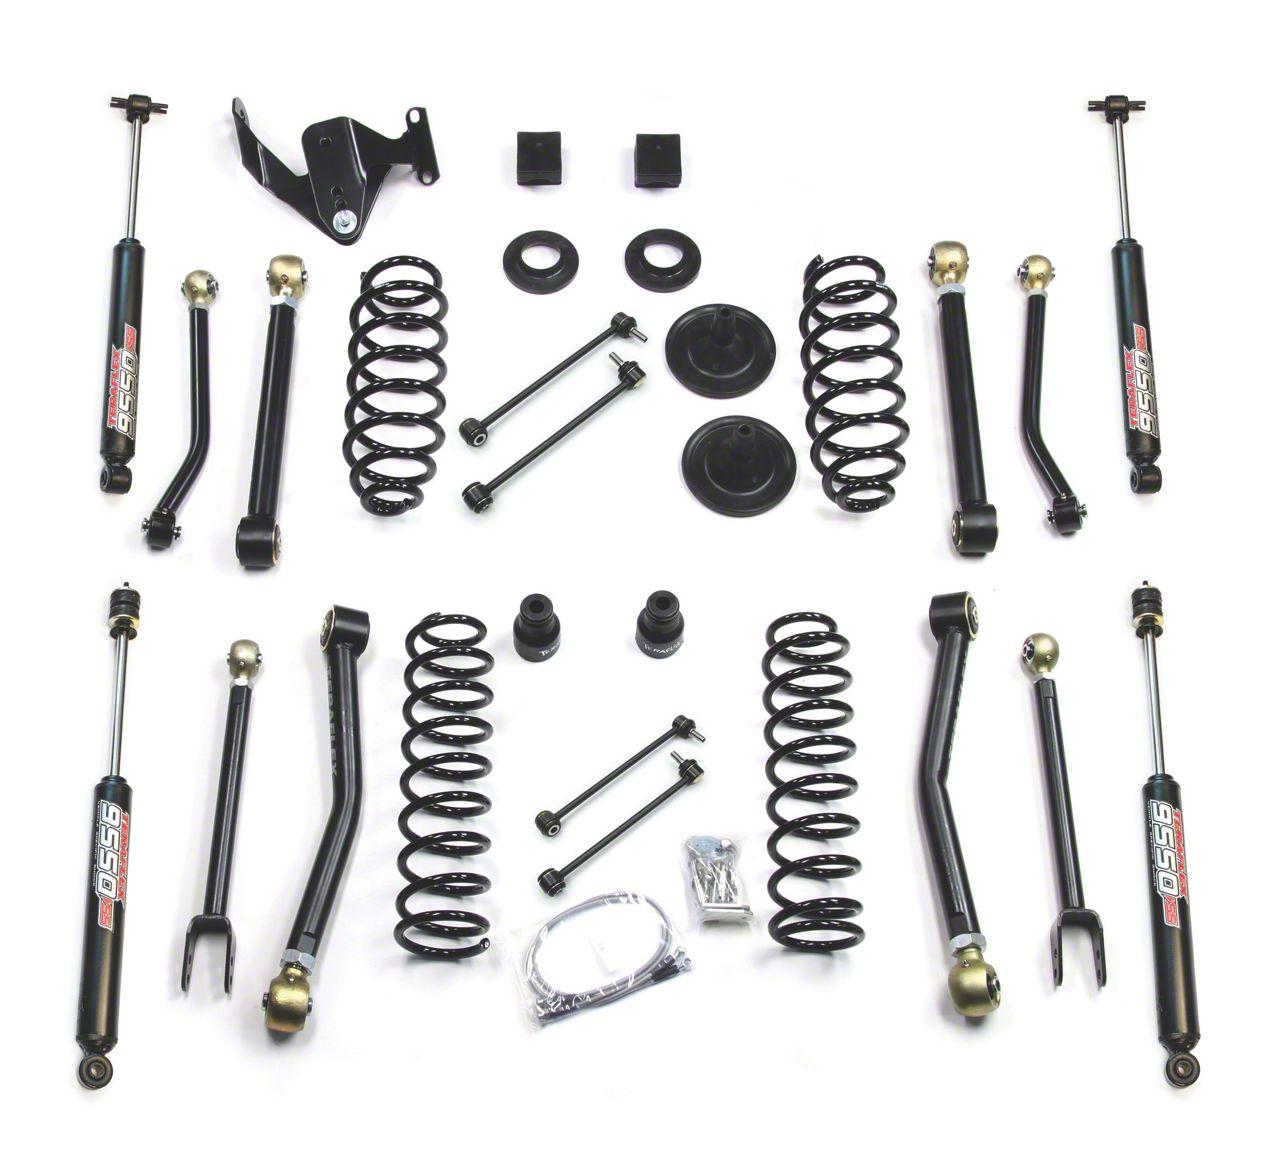 Teraflex 3 in. Lift Kit w/ 8 FlexArms & 9550 Shocks - Right Hand Drive (07-18 Jeep Wrangler JK 2 Door)